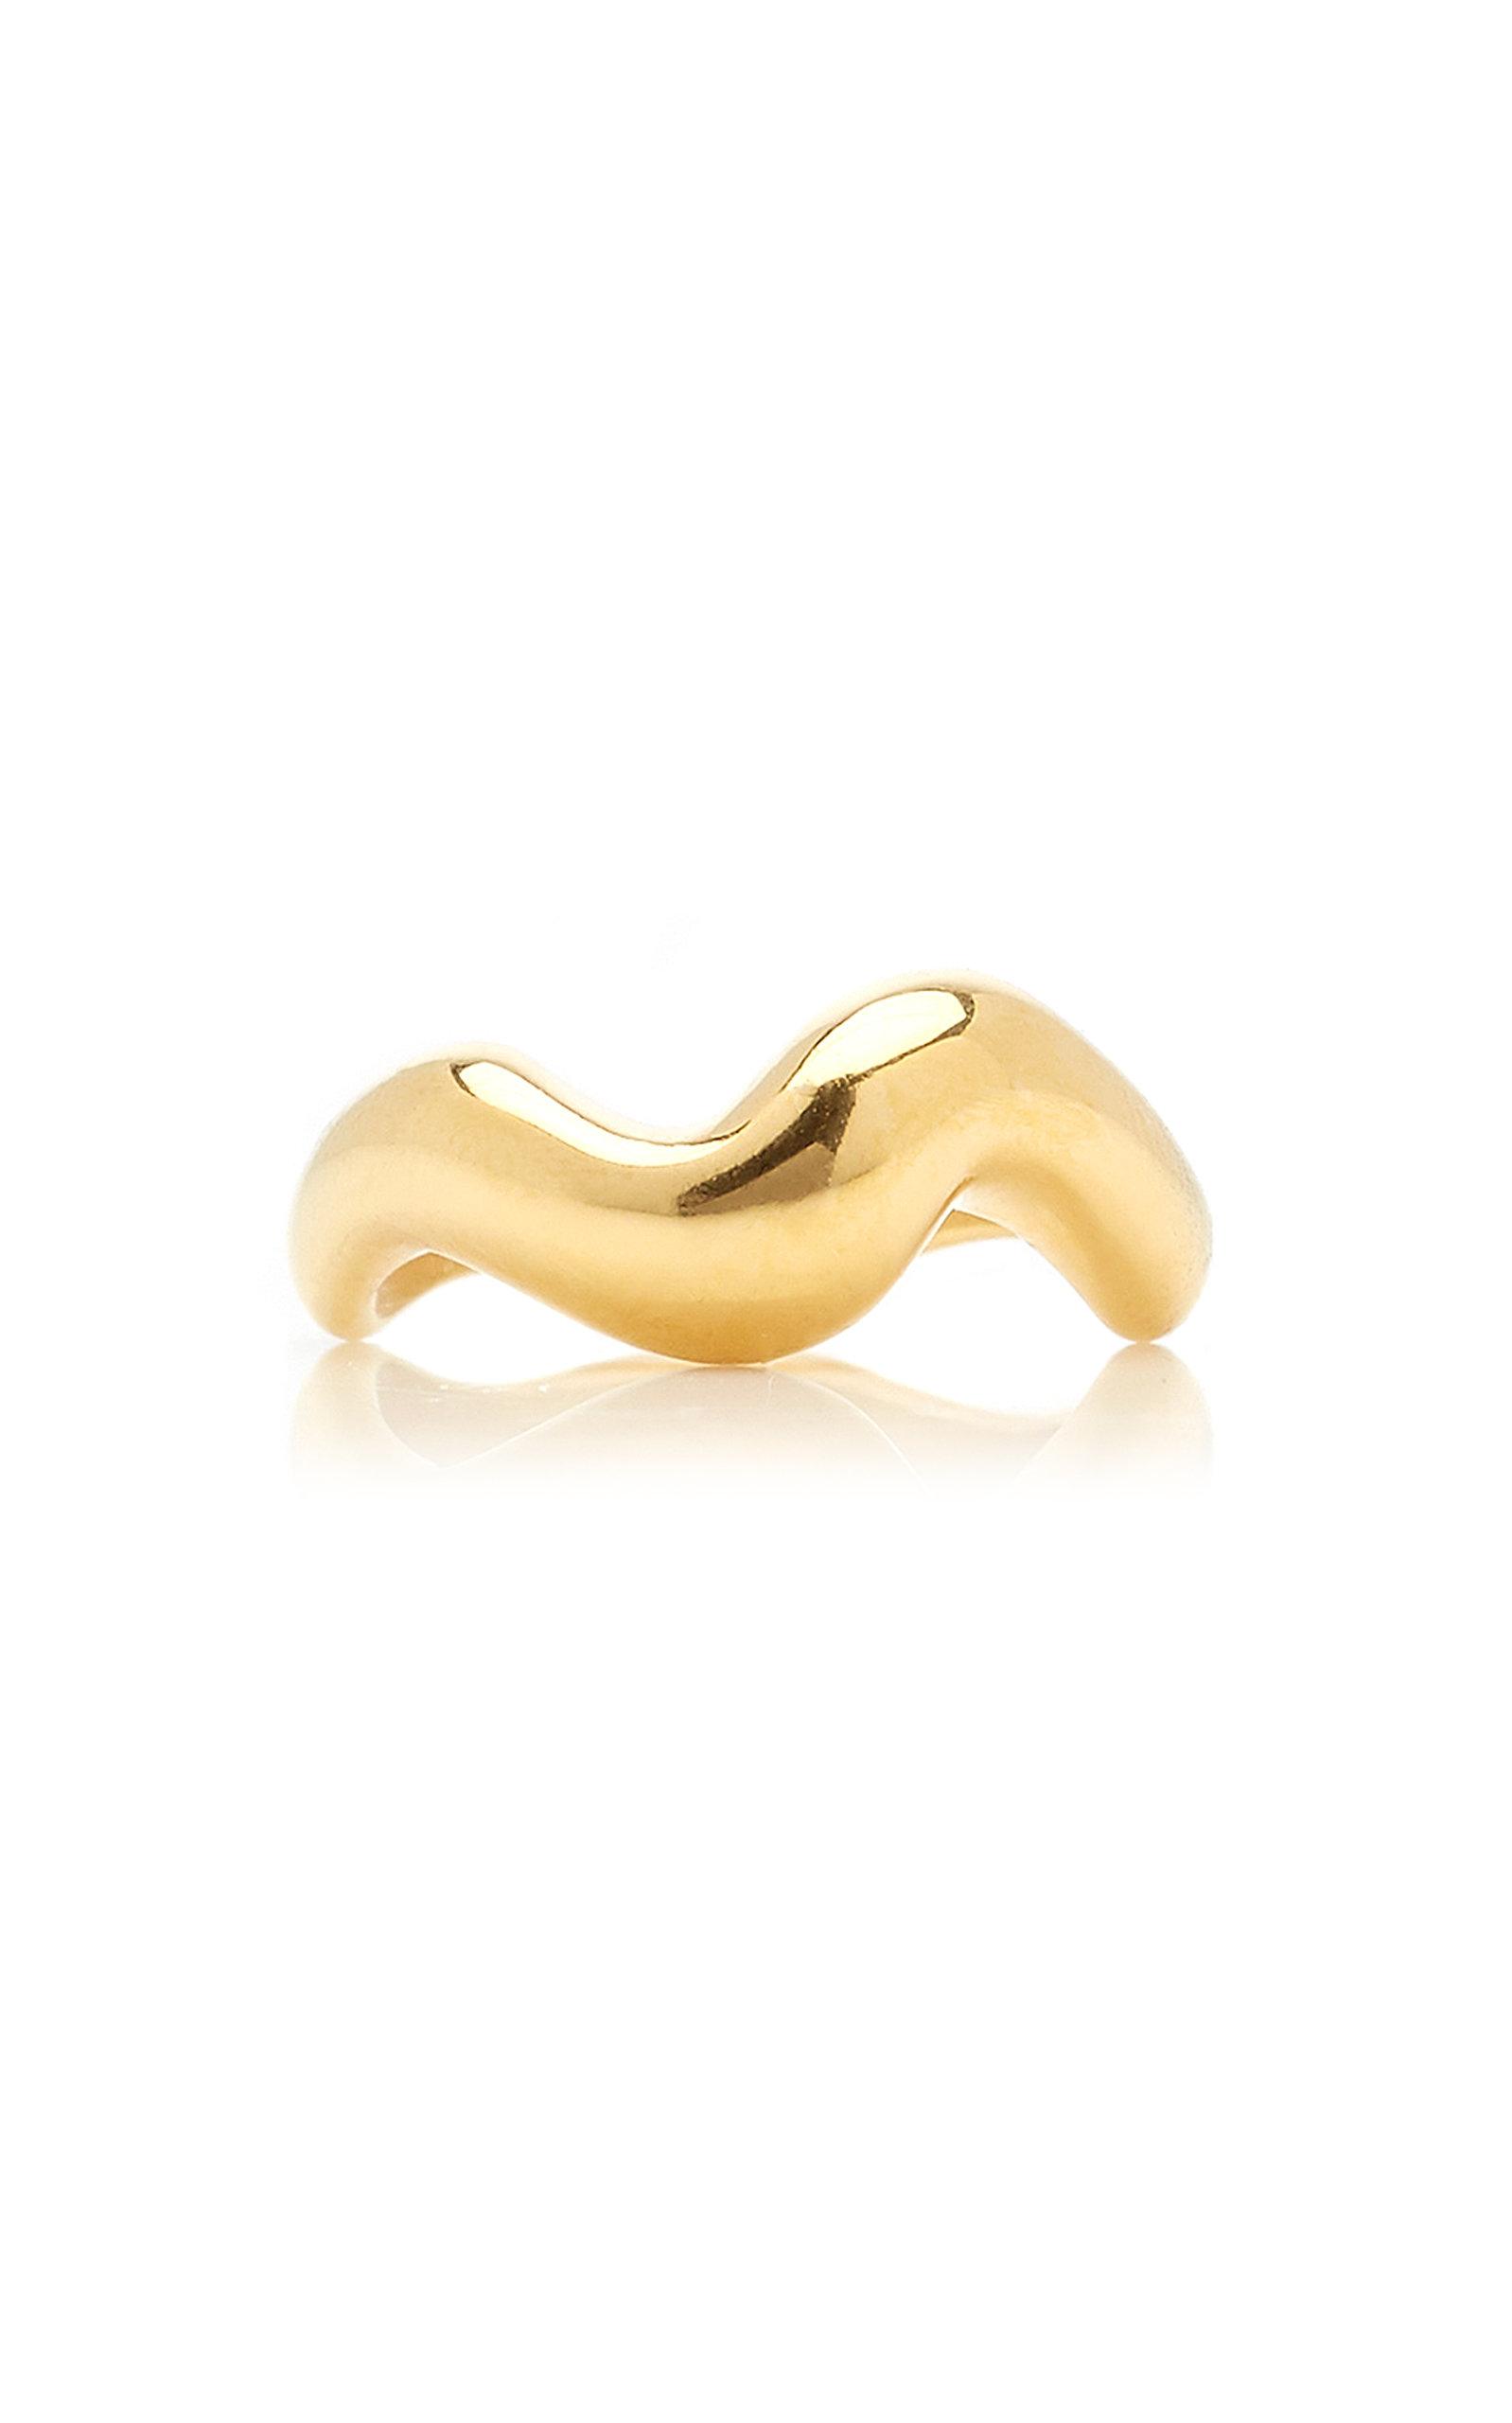 Louis Abel - Women's Aurea Polished 18k Gold Vermeil Ring - Gold - Moda Operandi